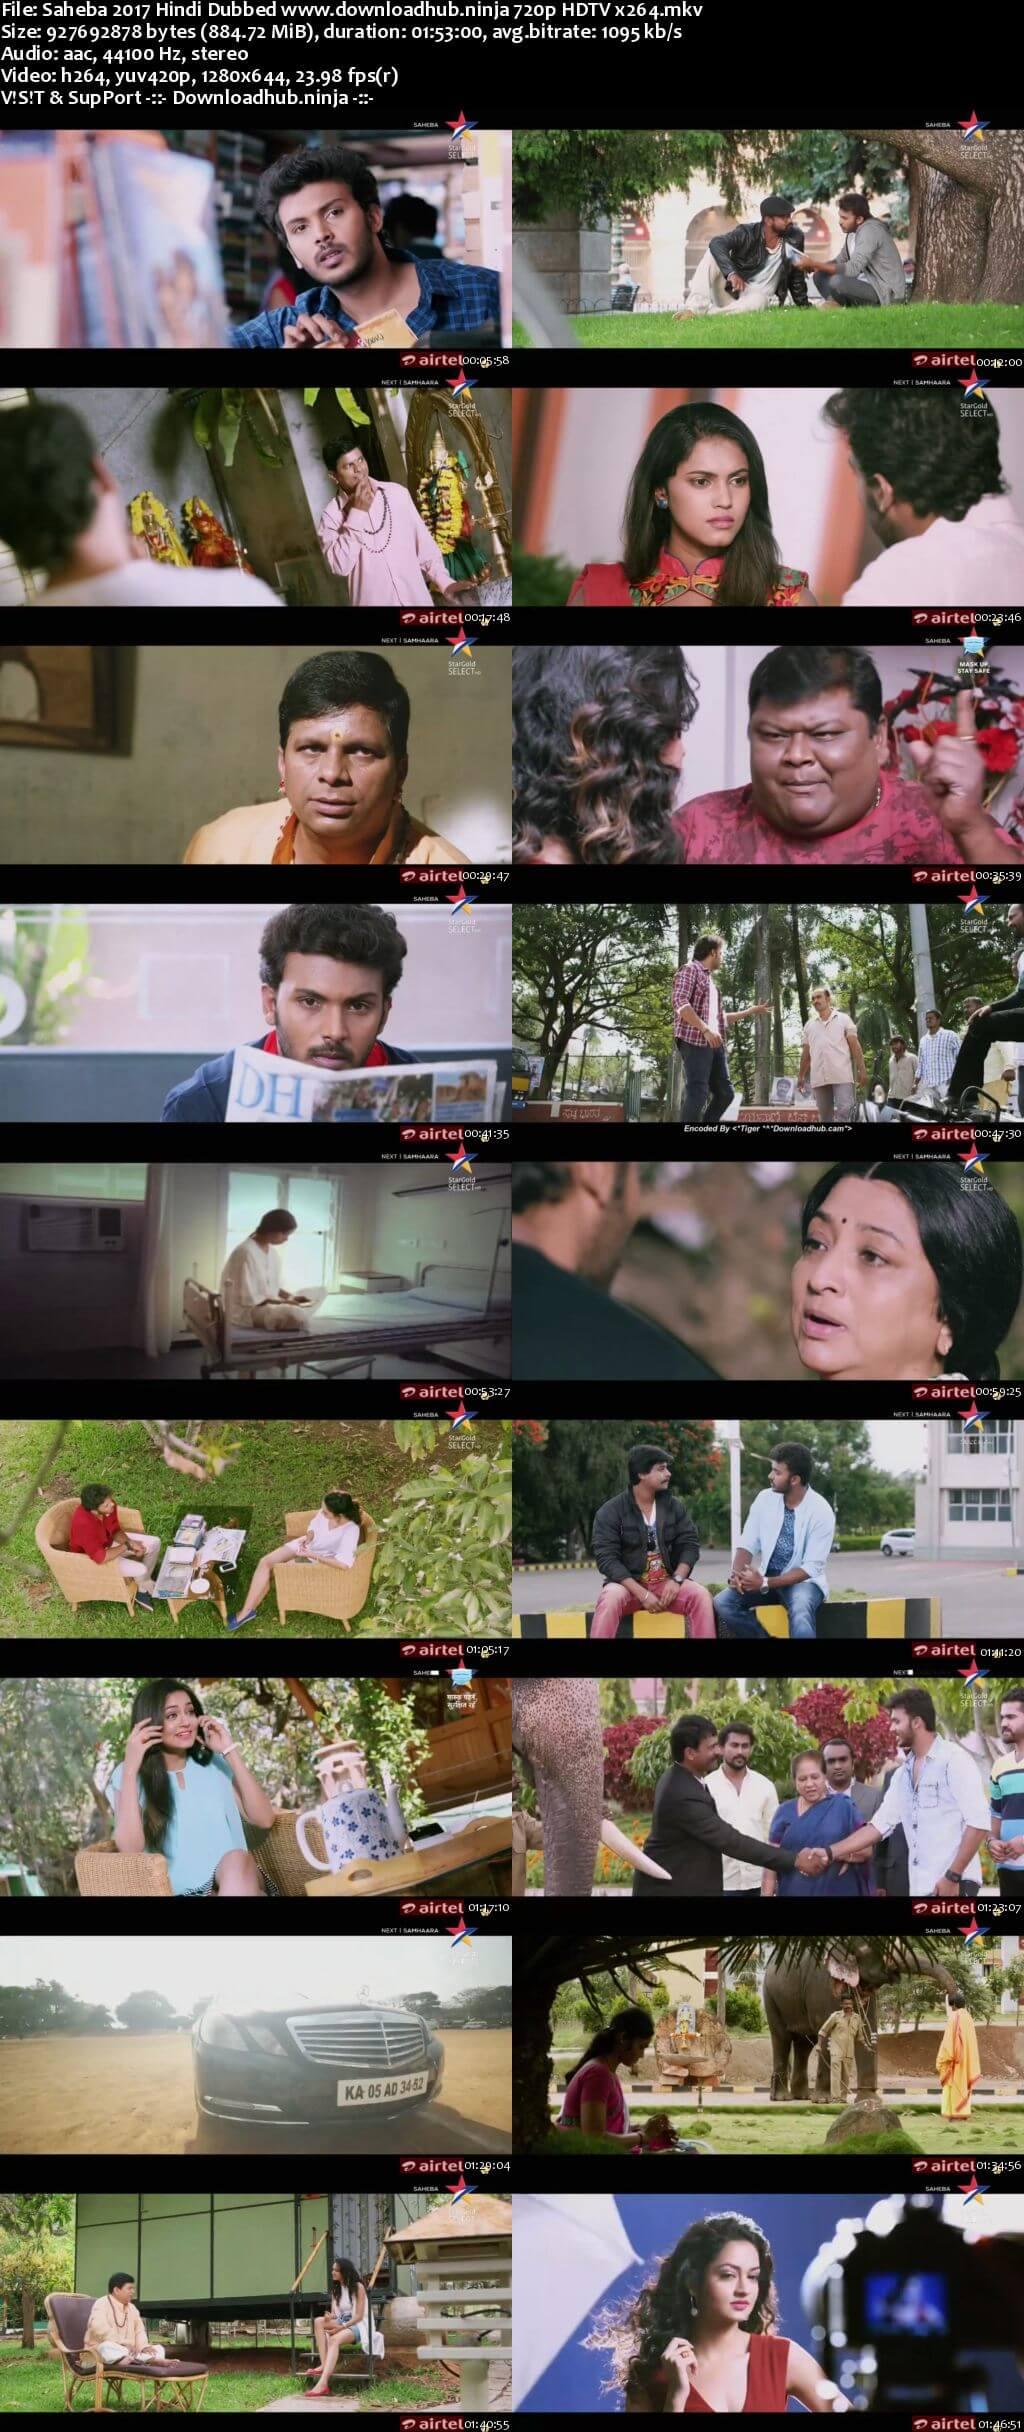 Saheba 2017 Hindi Dubbed 720p HDTV x264